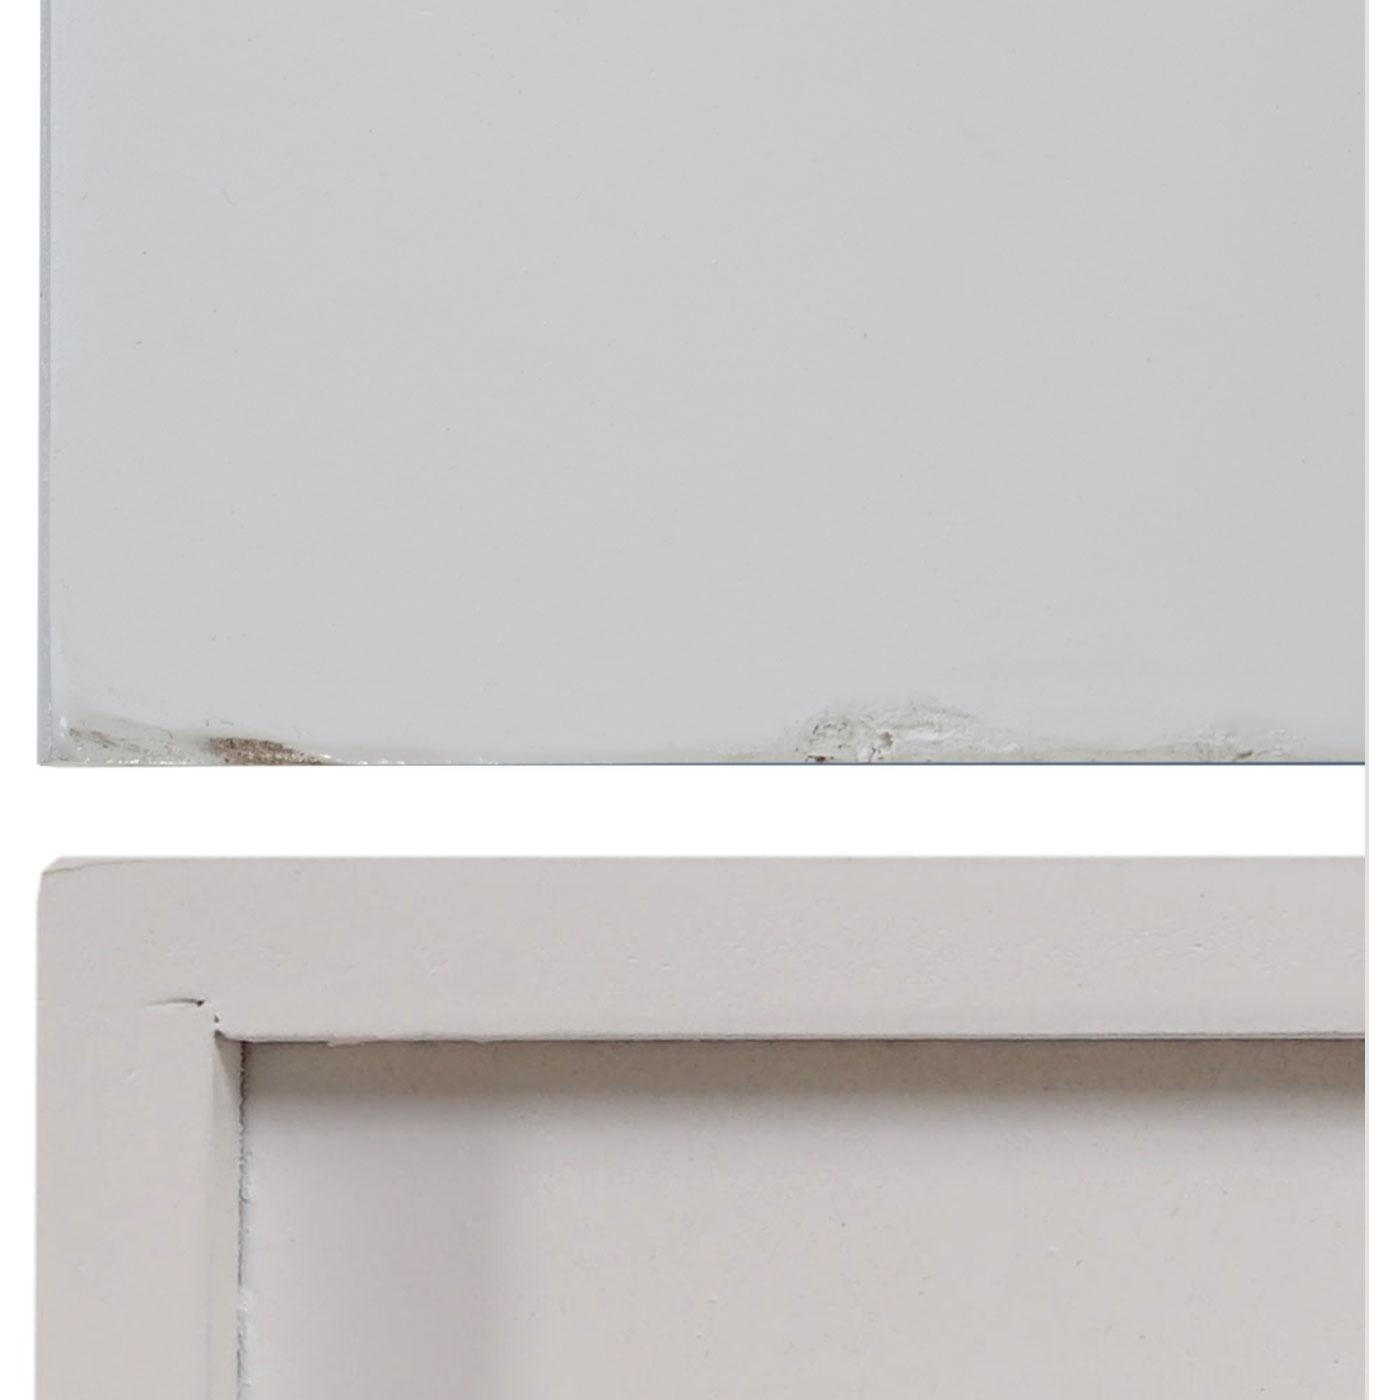 kommode vaasa t292 schrank sideboard retro design